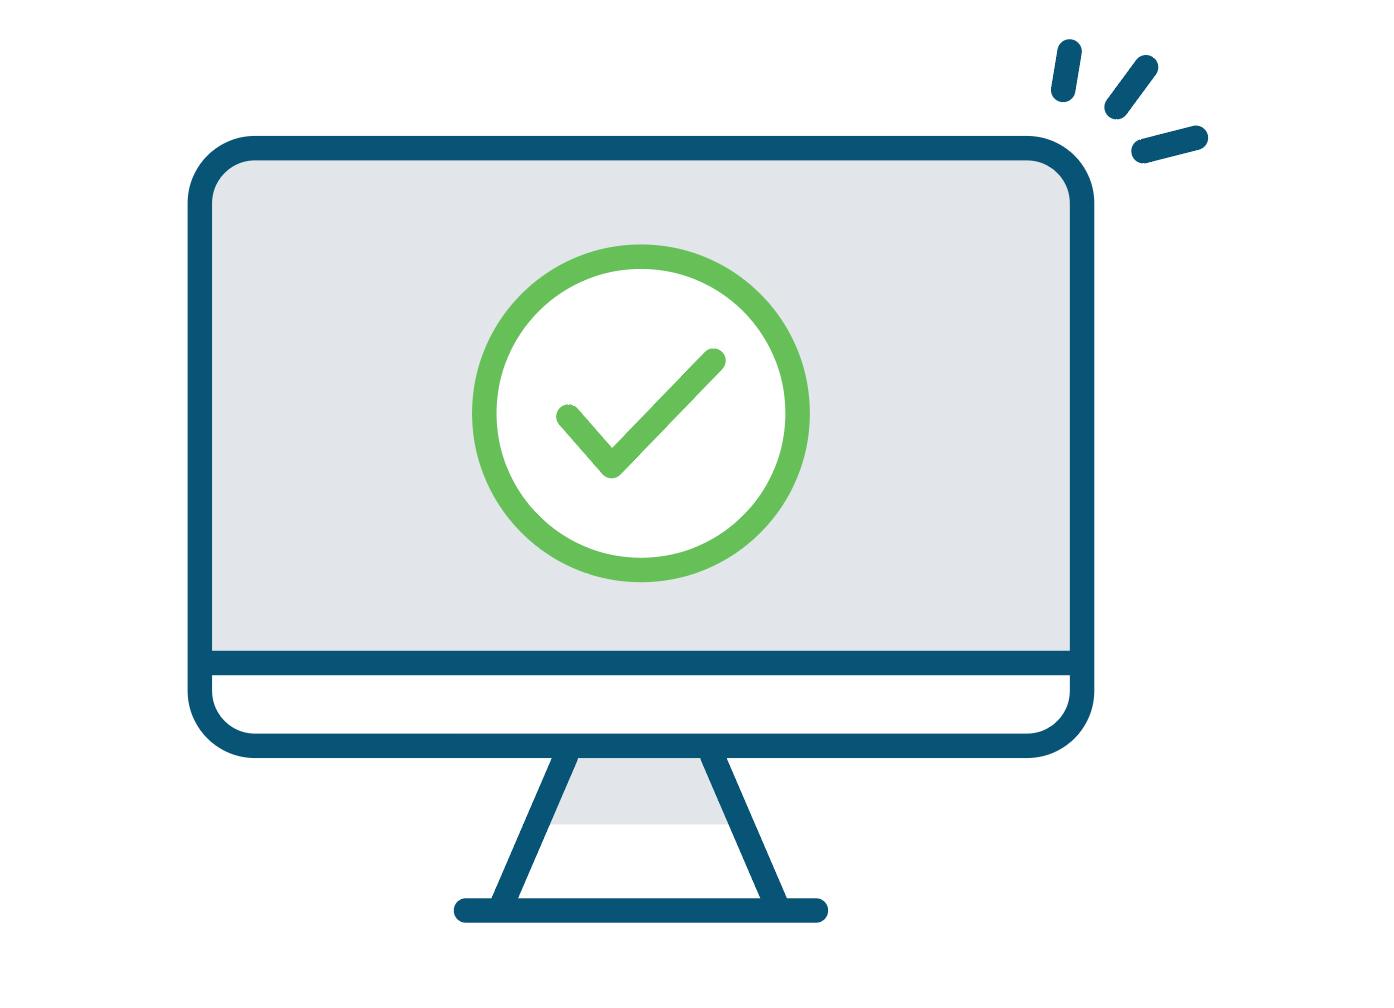 Green tick icon on a computer screen vector